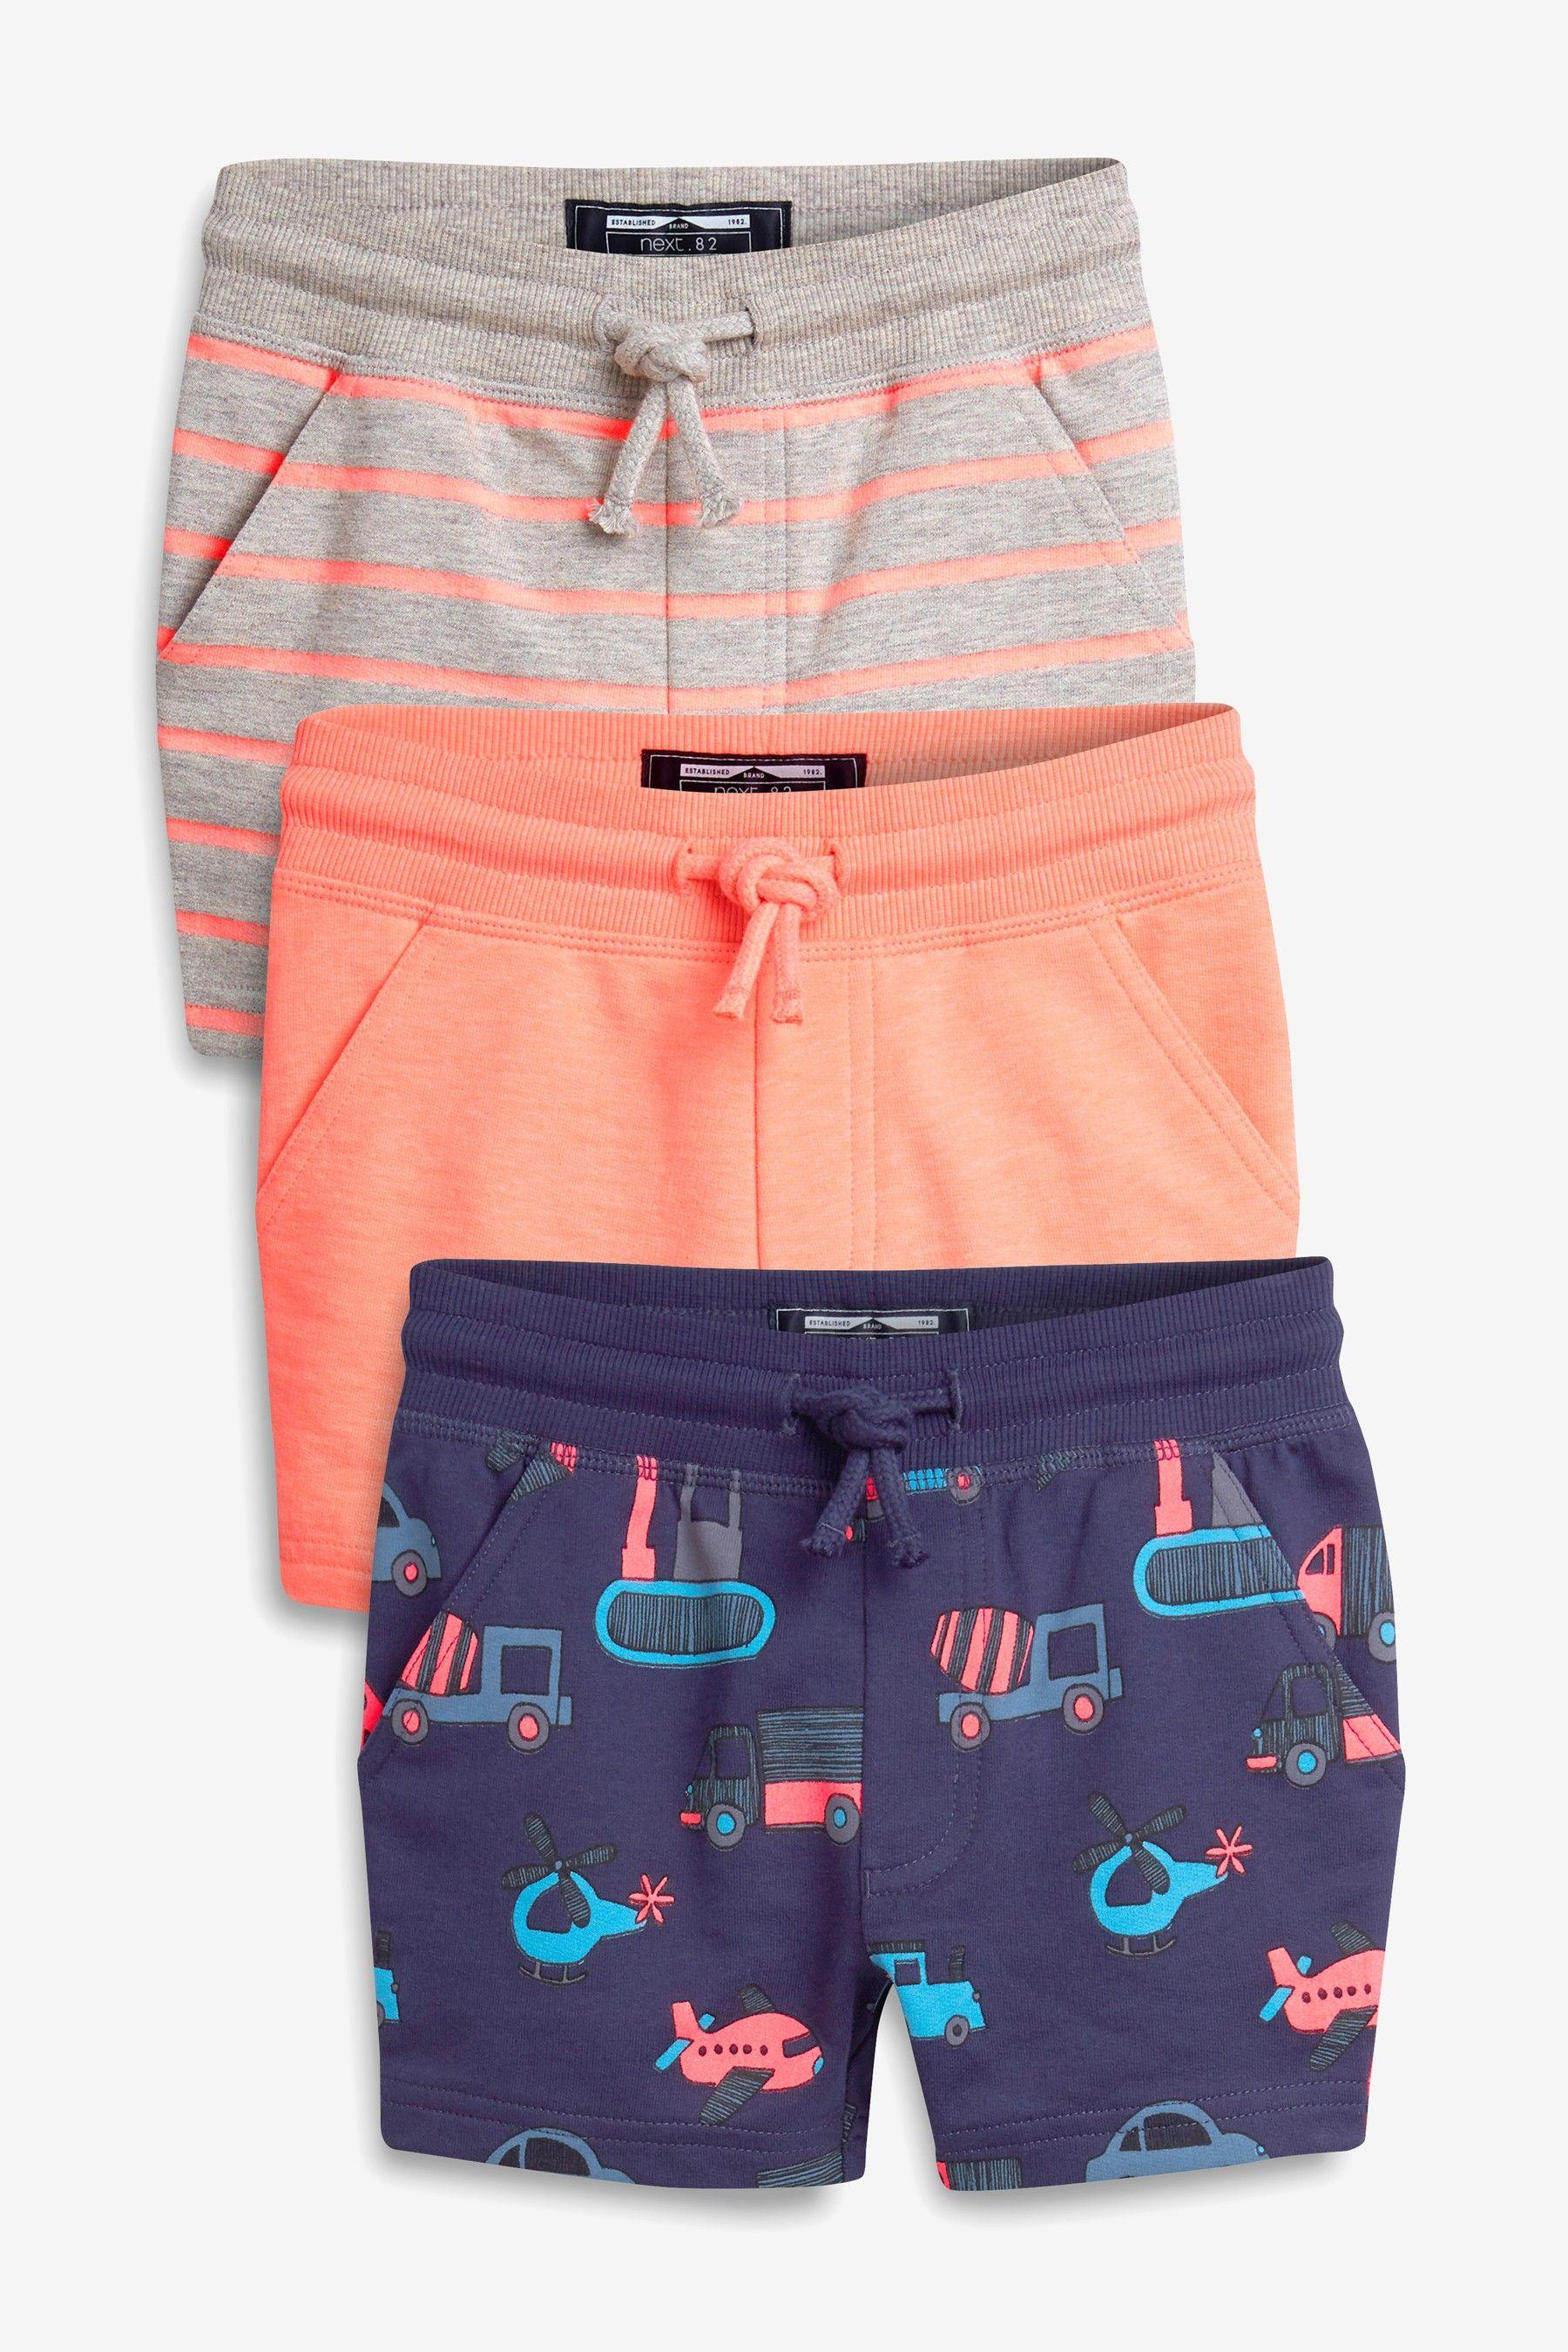 30139eb85 Boys Next Blue Fluro Digger Shorts Three Pack (3mths-7yrs) - Blue in ...